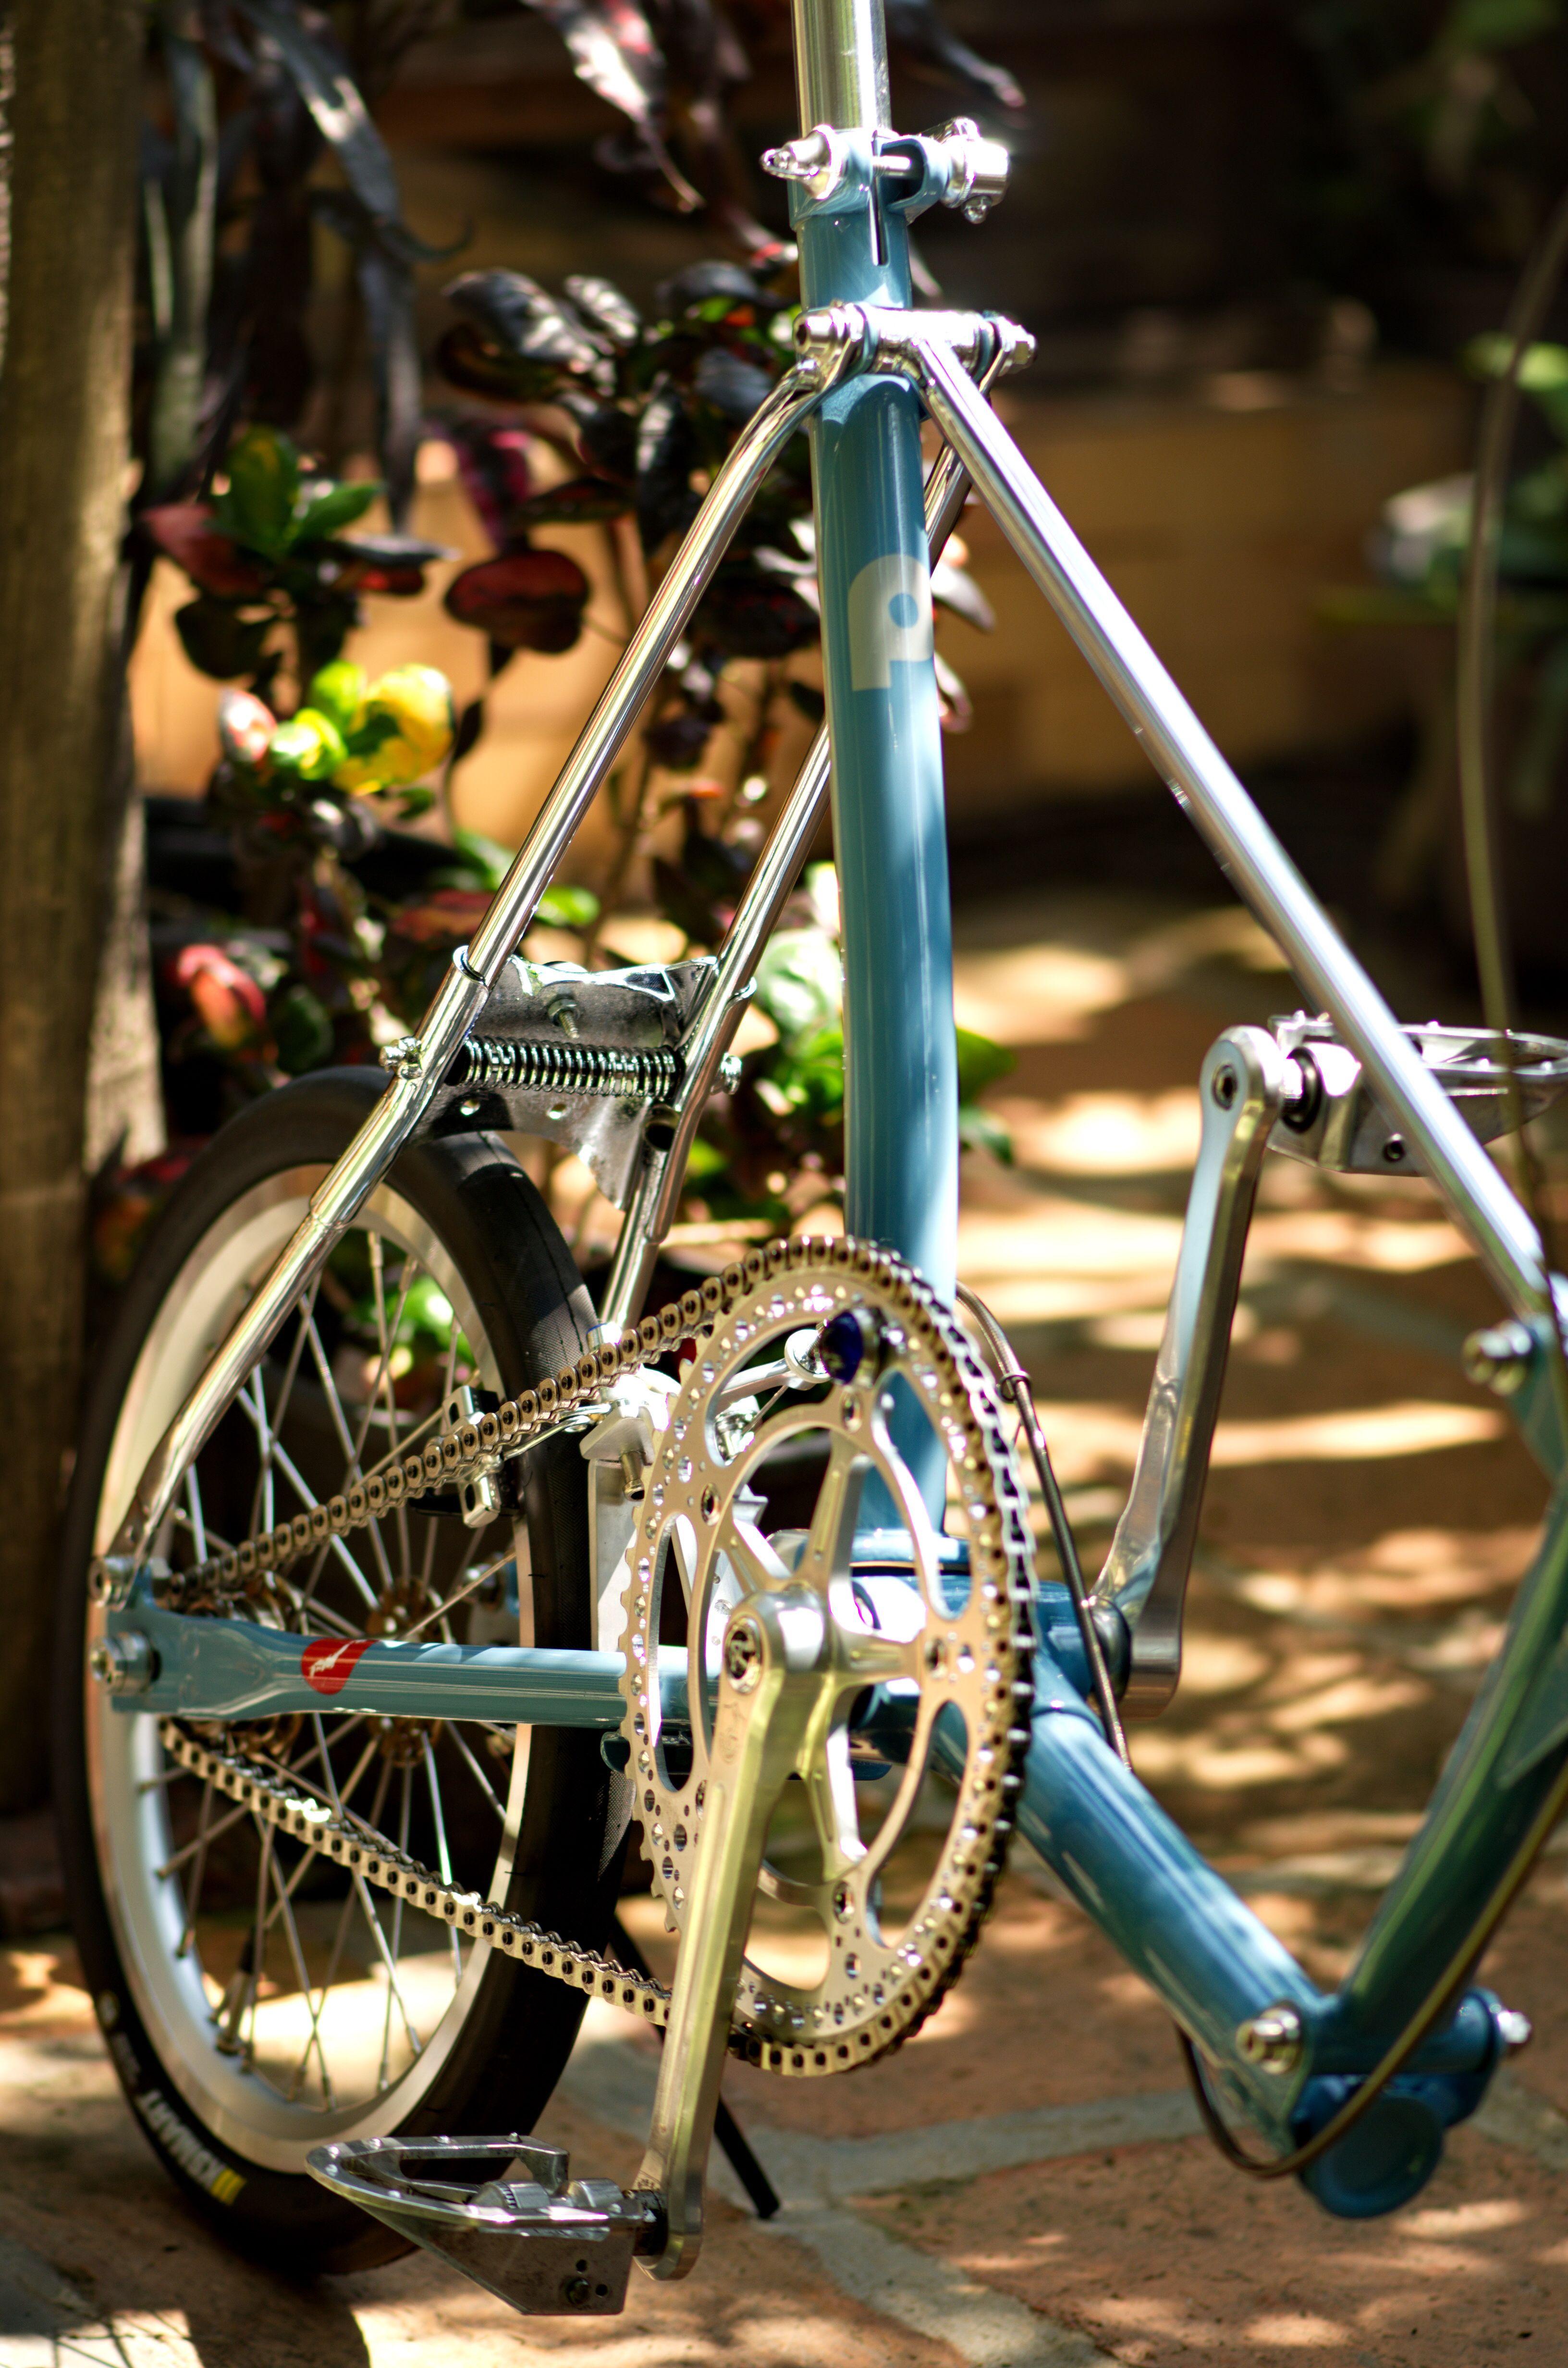 Japan Bike Folding Bike Mini Velo 16 Wheel Bridgestone